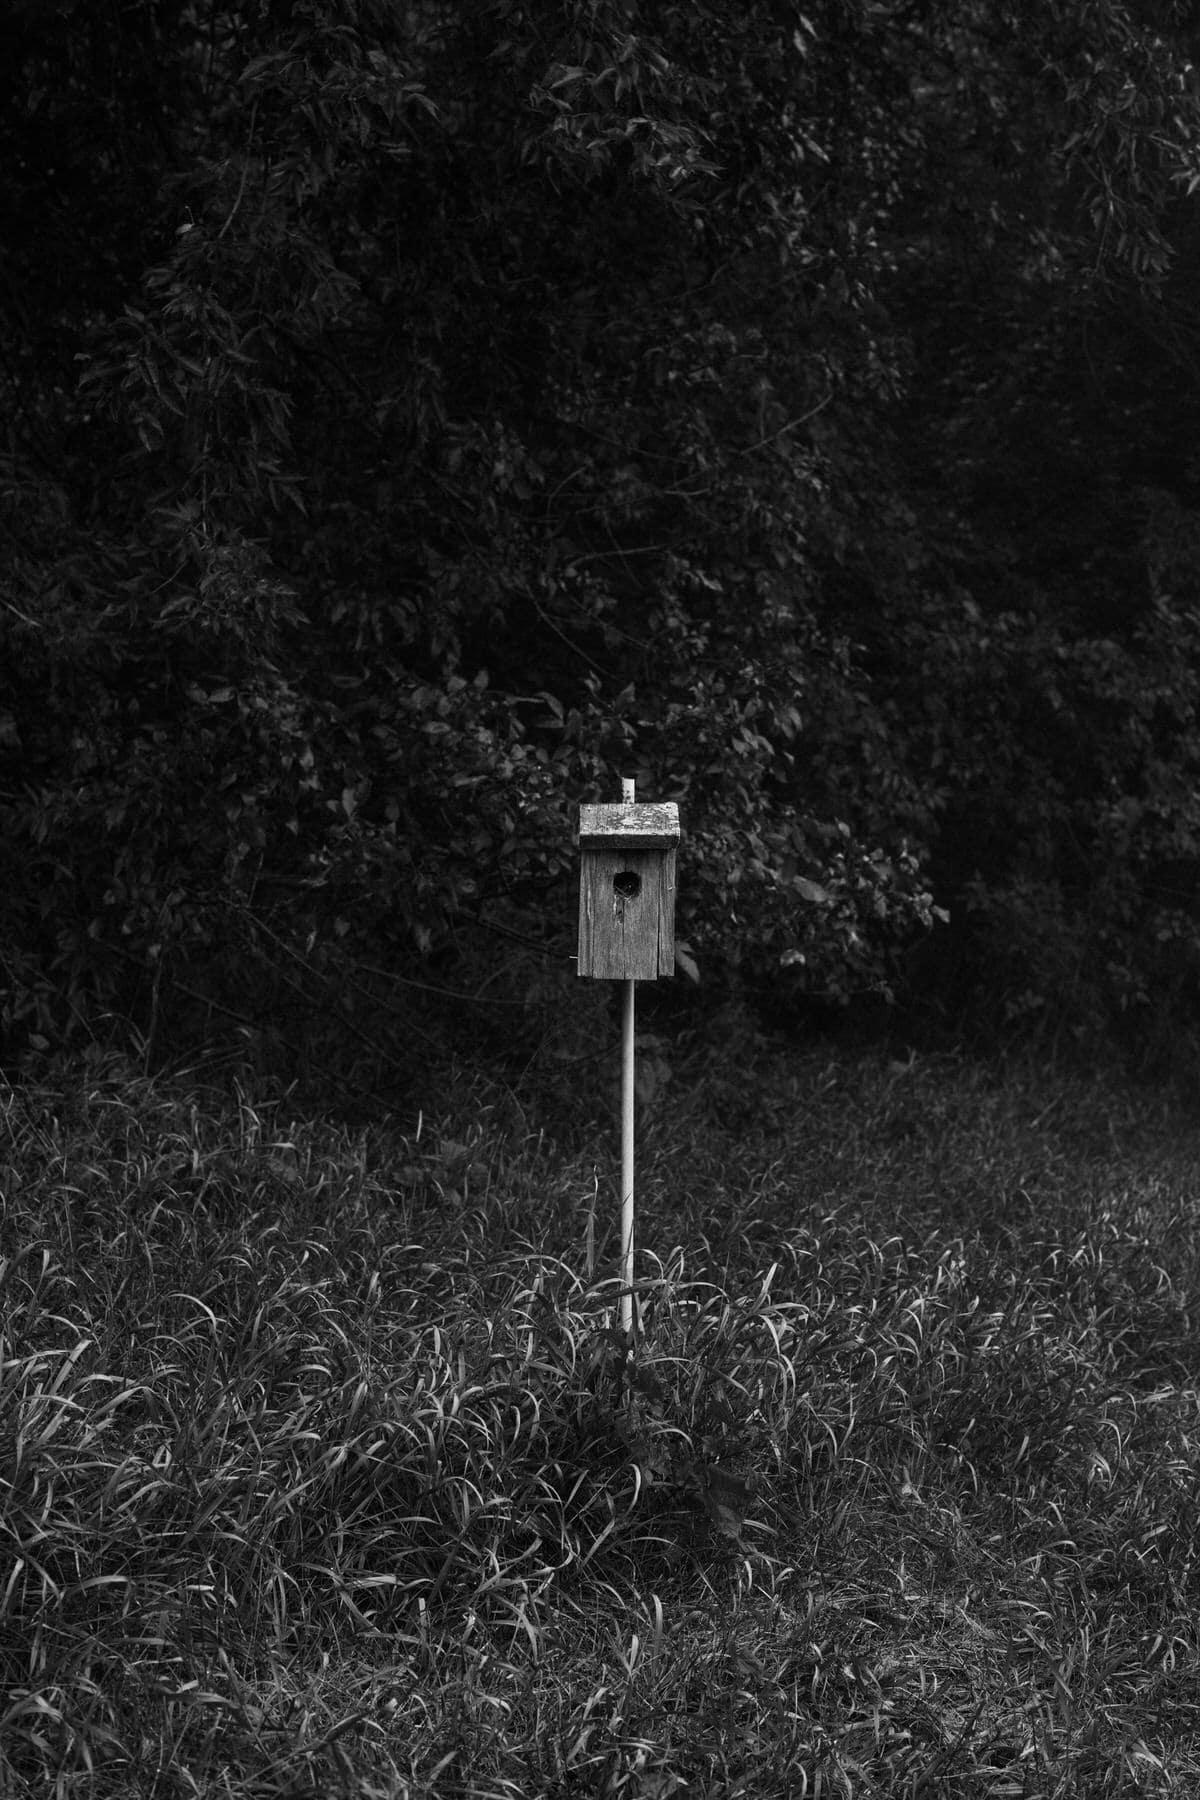 Kiekhaefer-Park-Fond-du-Lac-Wisconsin-black-and-white-fine-art-photography-by-Studio-L-photographer-Laura-Schneider-_3388